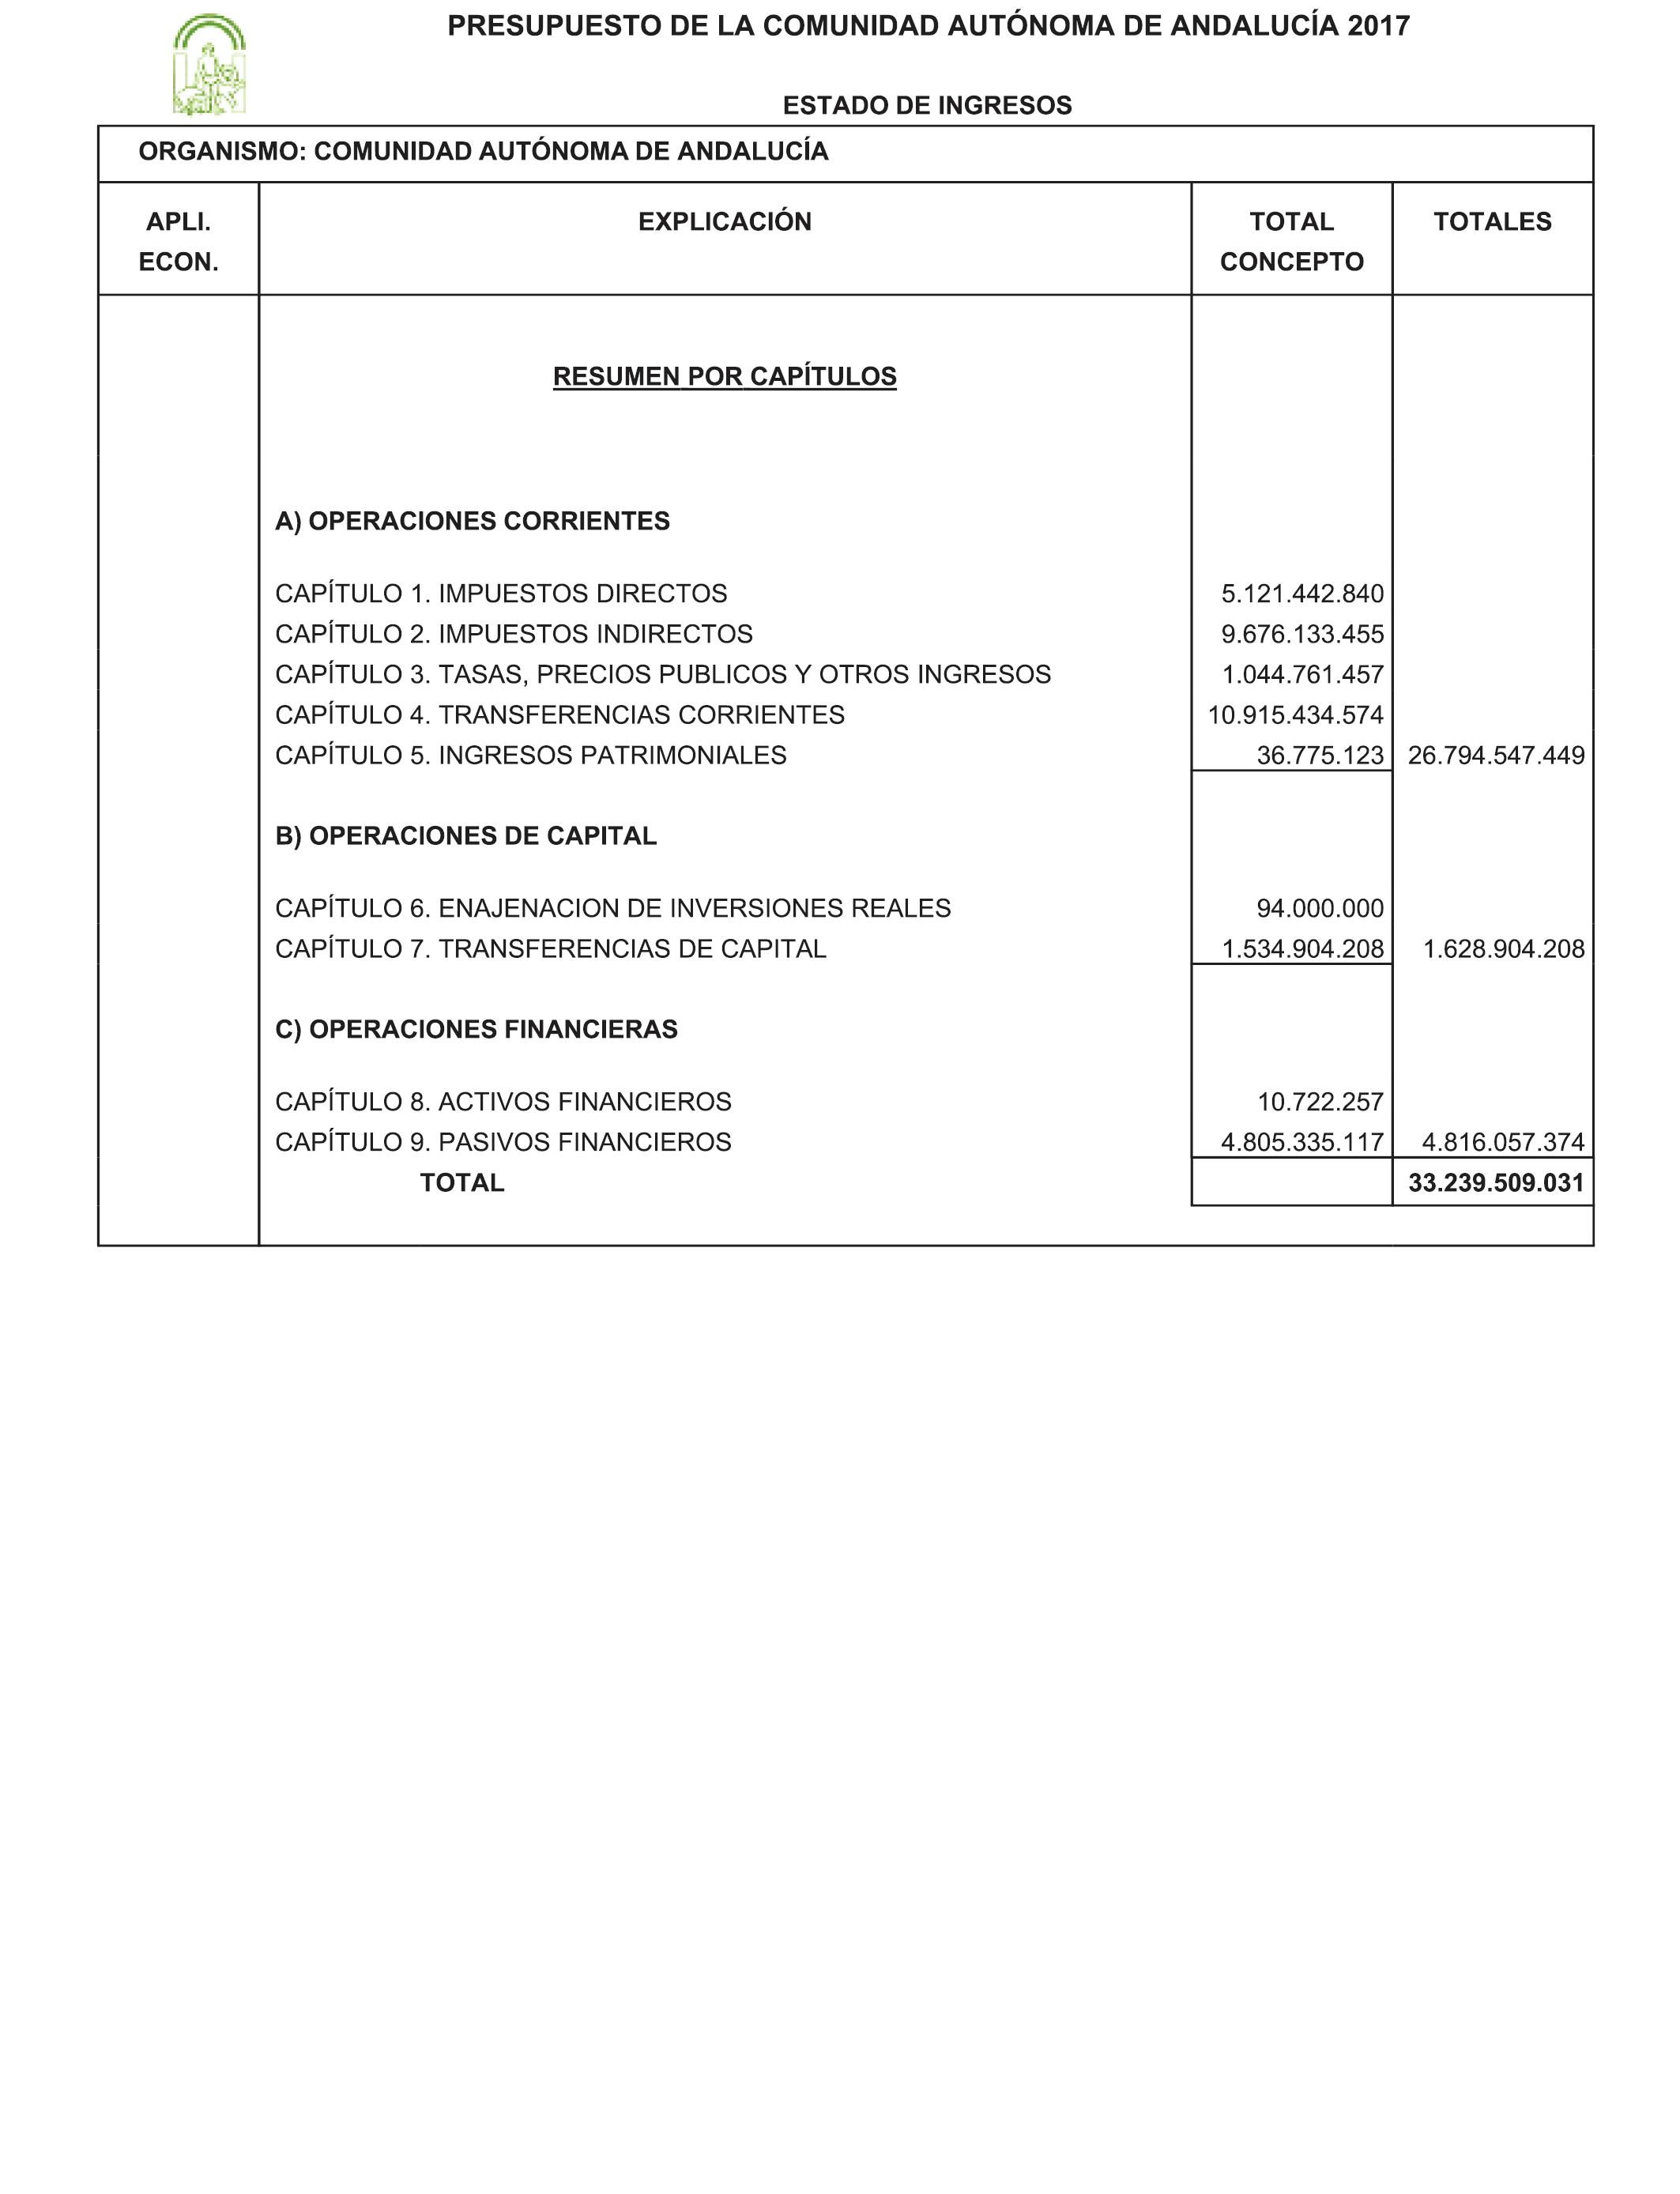 BOE.es - Documento BOE-A-2017-658